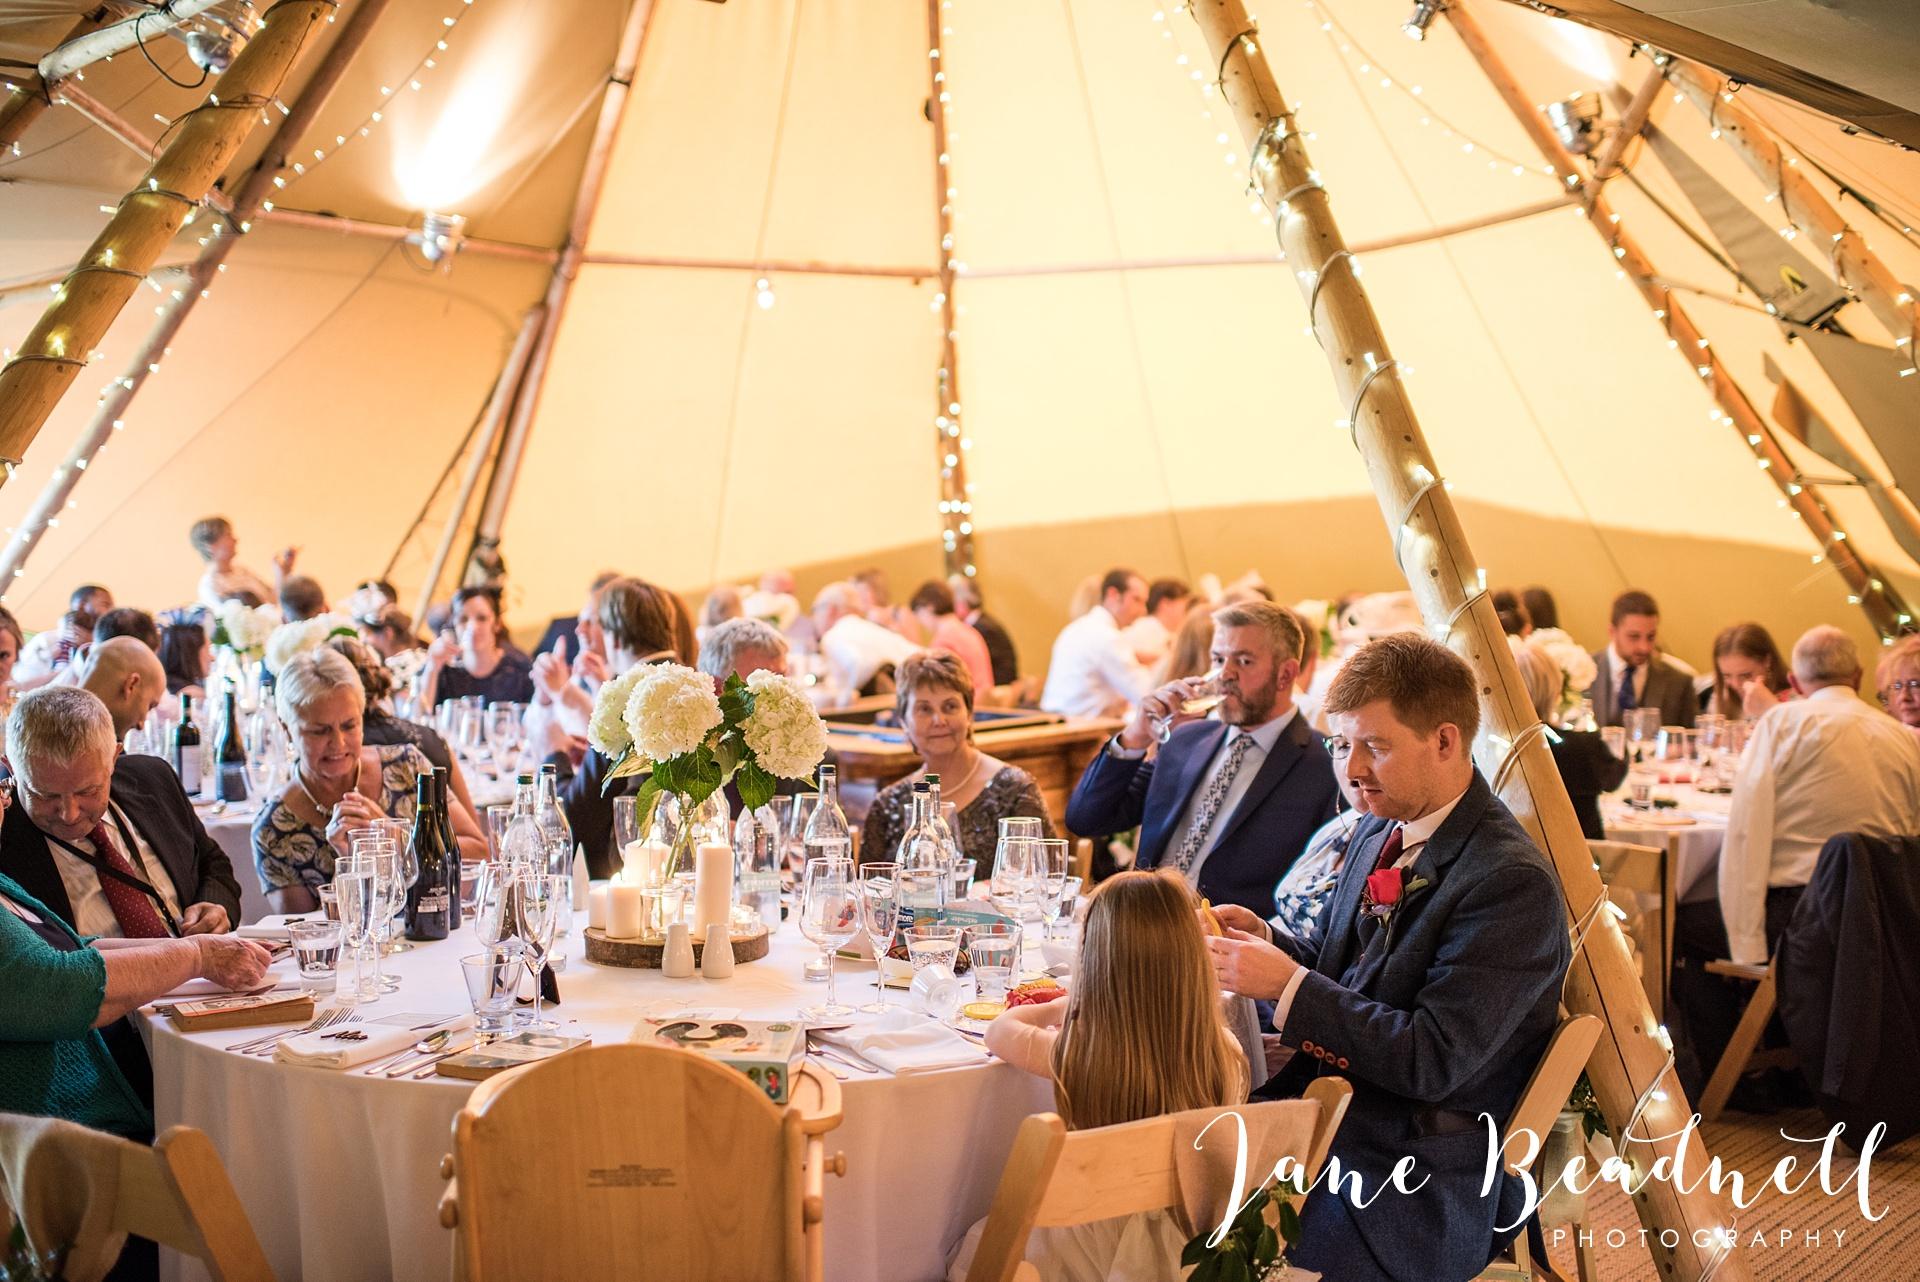 fine-art-wedding-photographer-jane-beadnell-yorkshire-wedding-photographer_0122